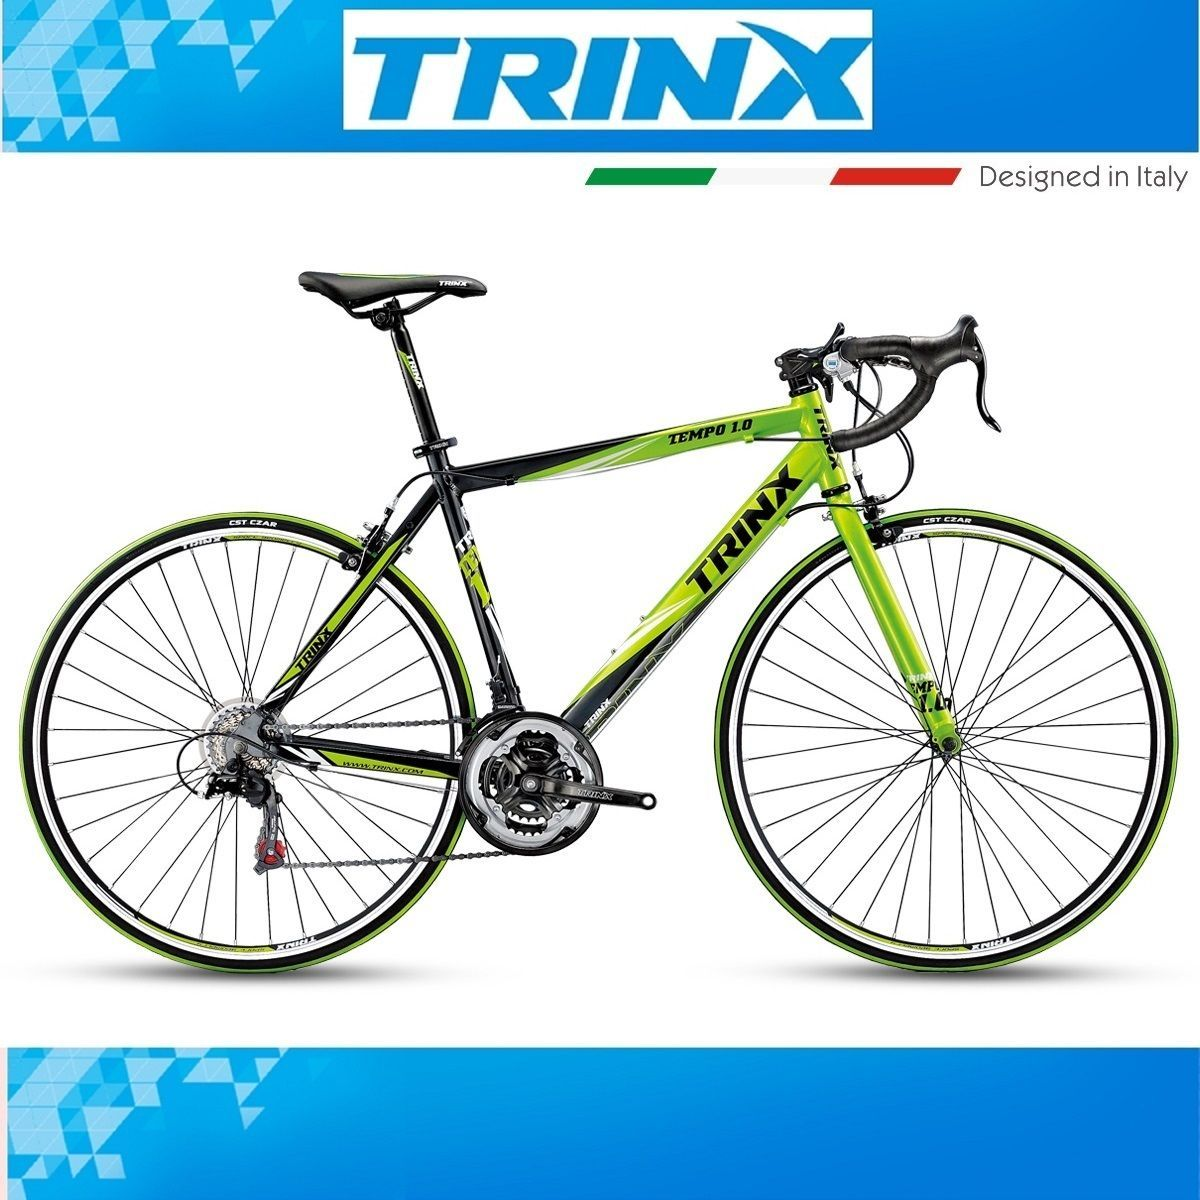 Ebay Angebot 700c Rennrad 28 Zoll Trinx Tempo 1 0 Roadbike Rh 52